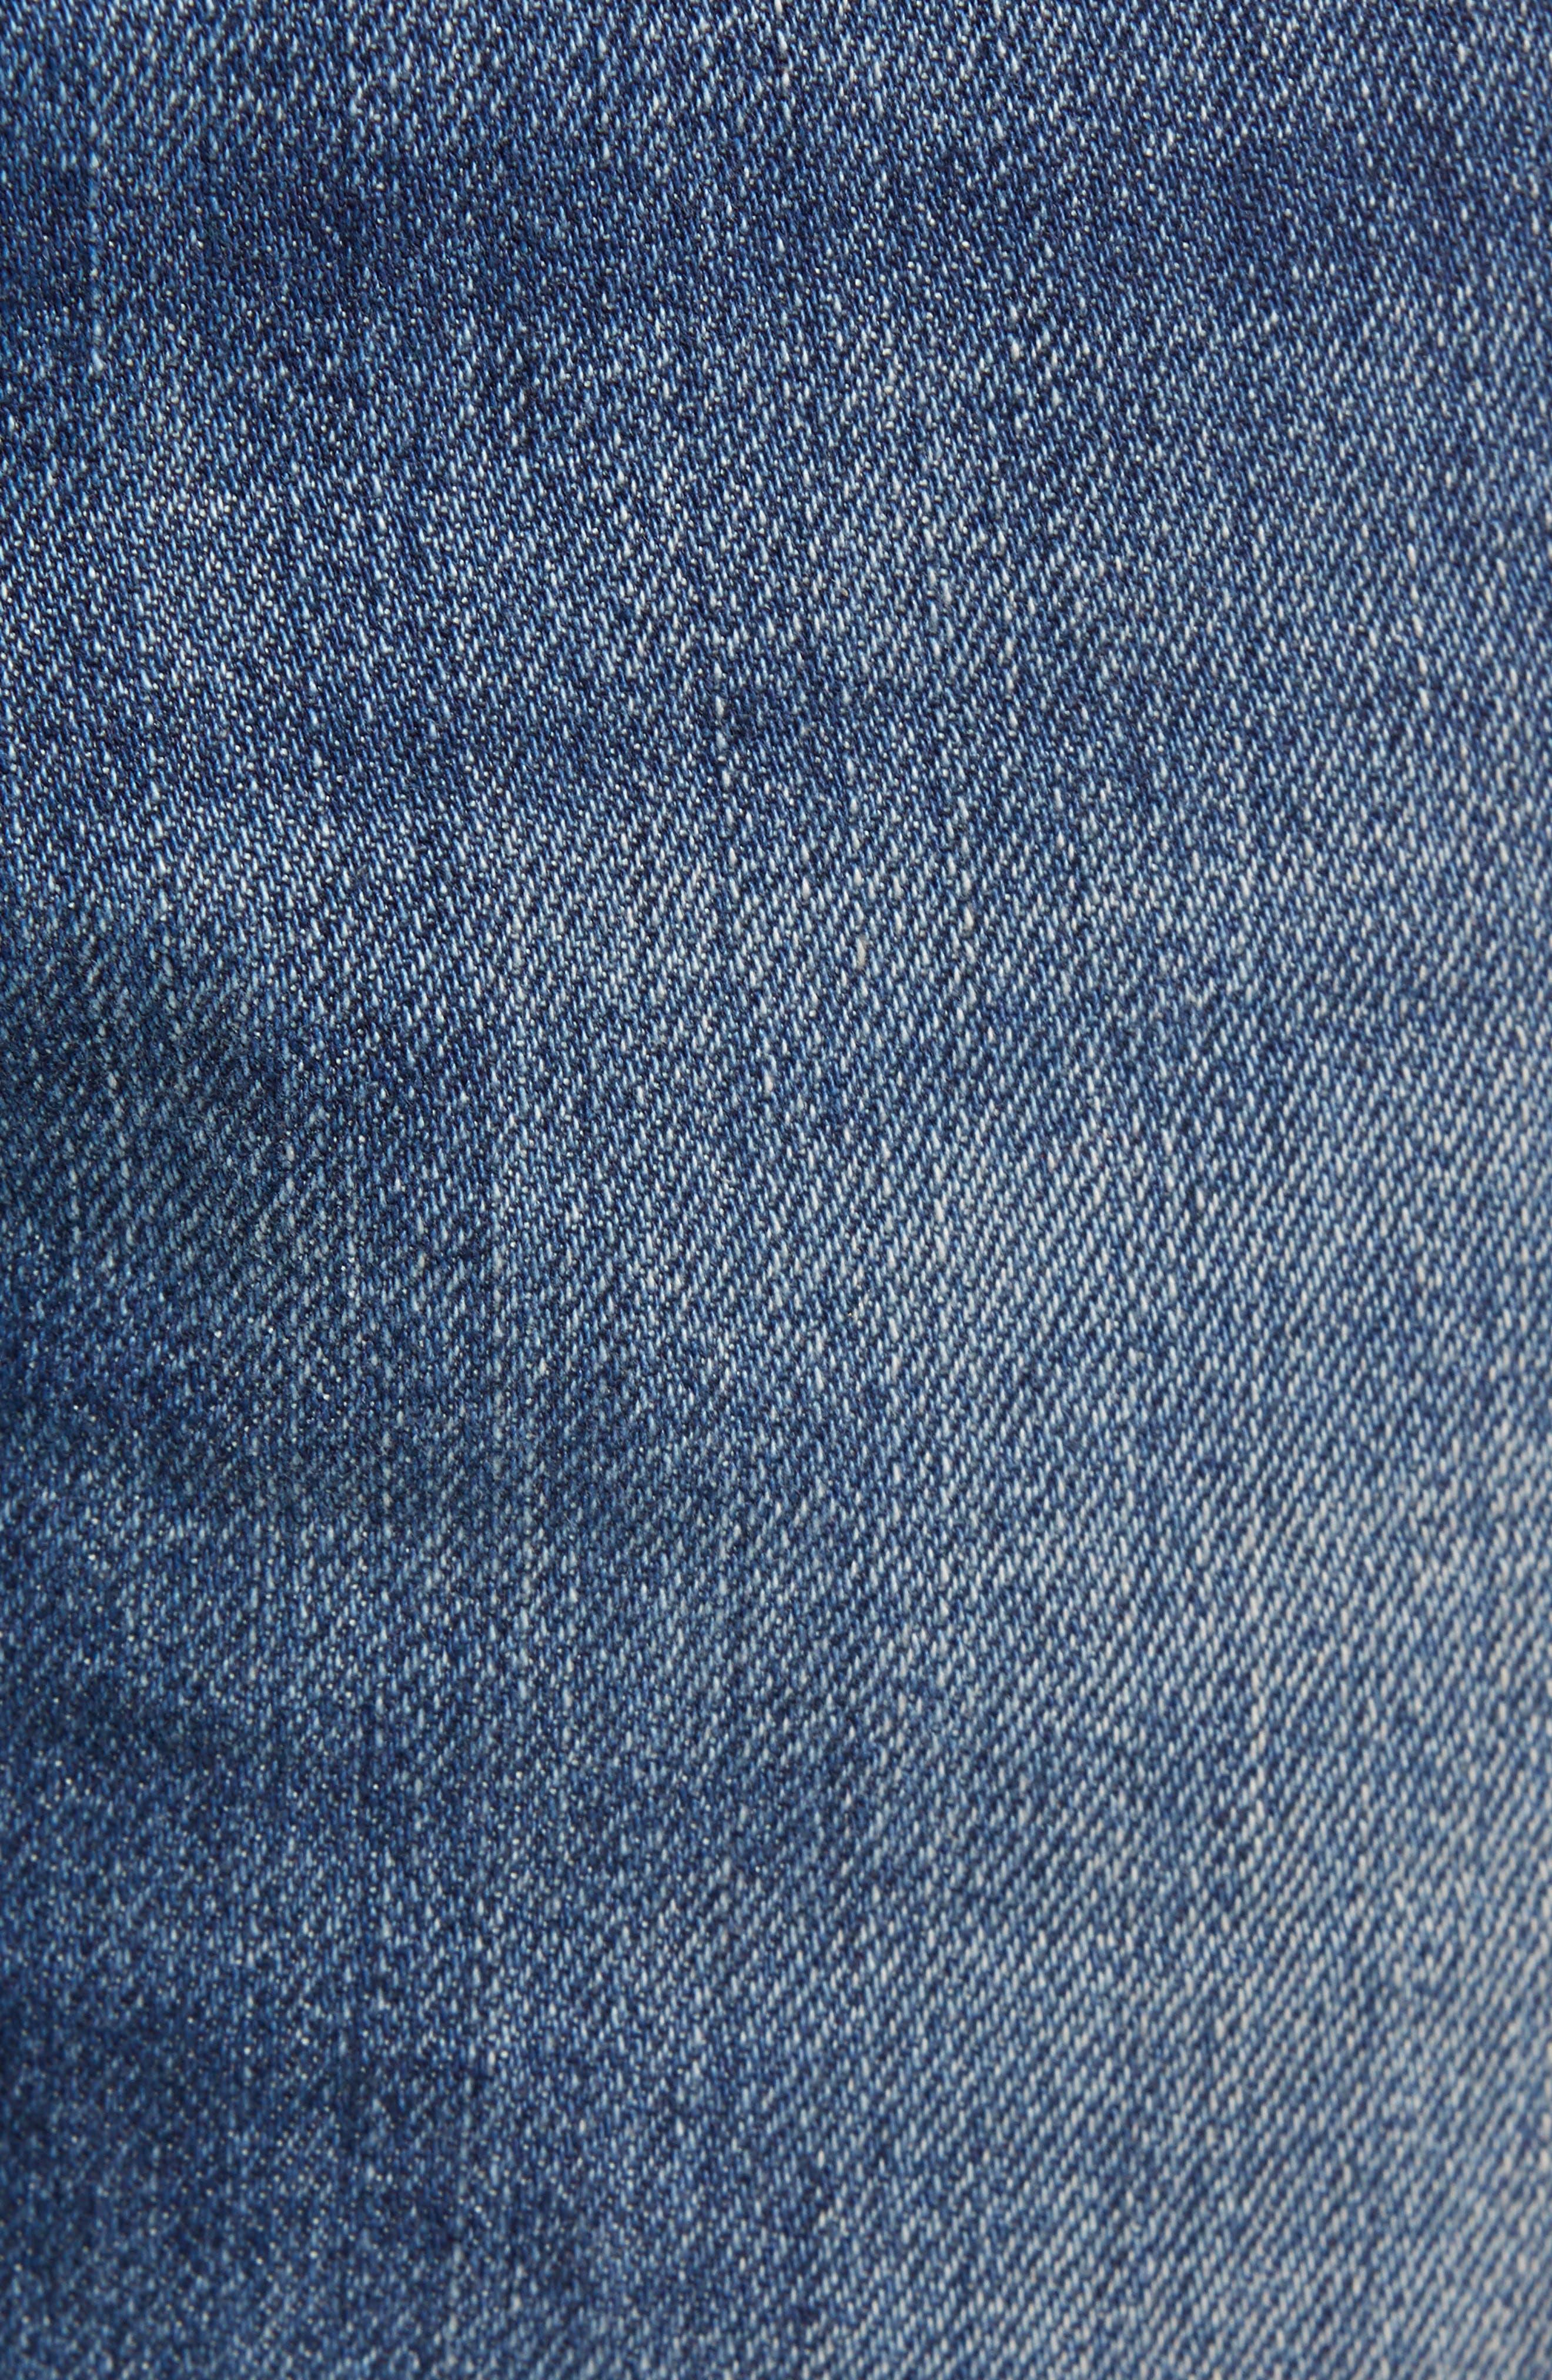 DIESEL<SUP>®</SUP>, Zatiny Bootcut Jeans, Alternate thumbnail 6, color, DENIM